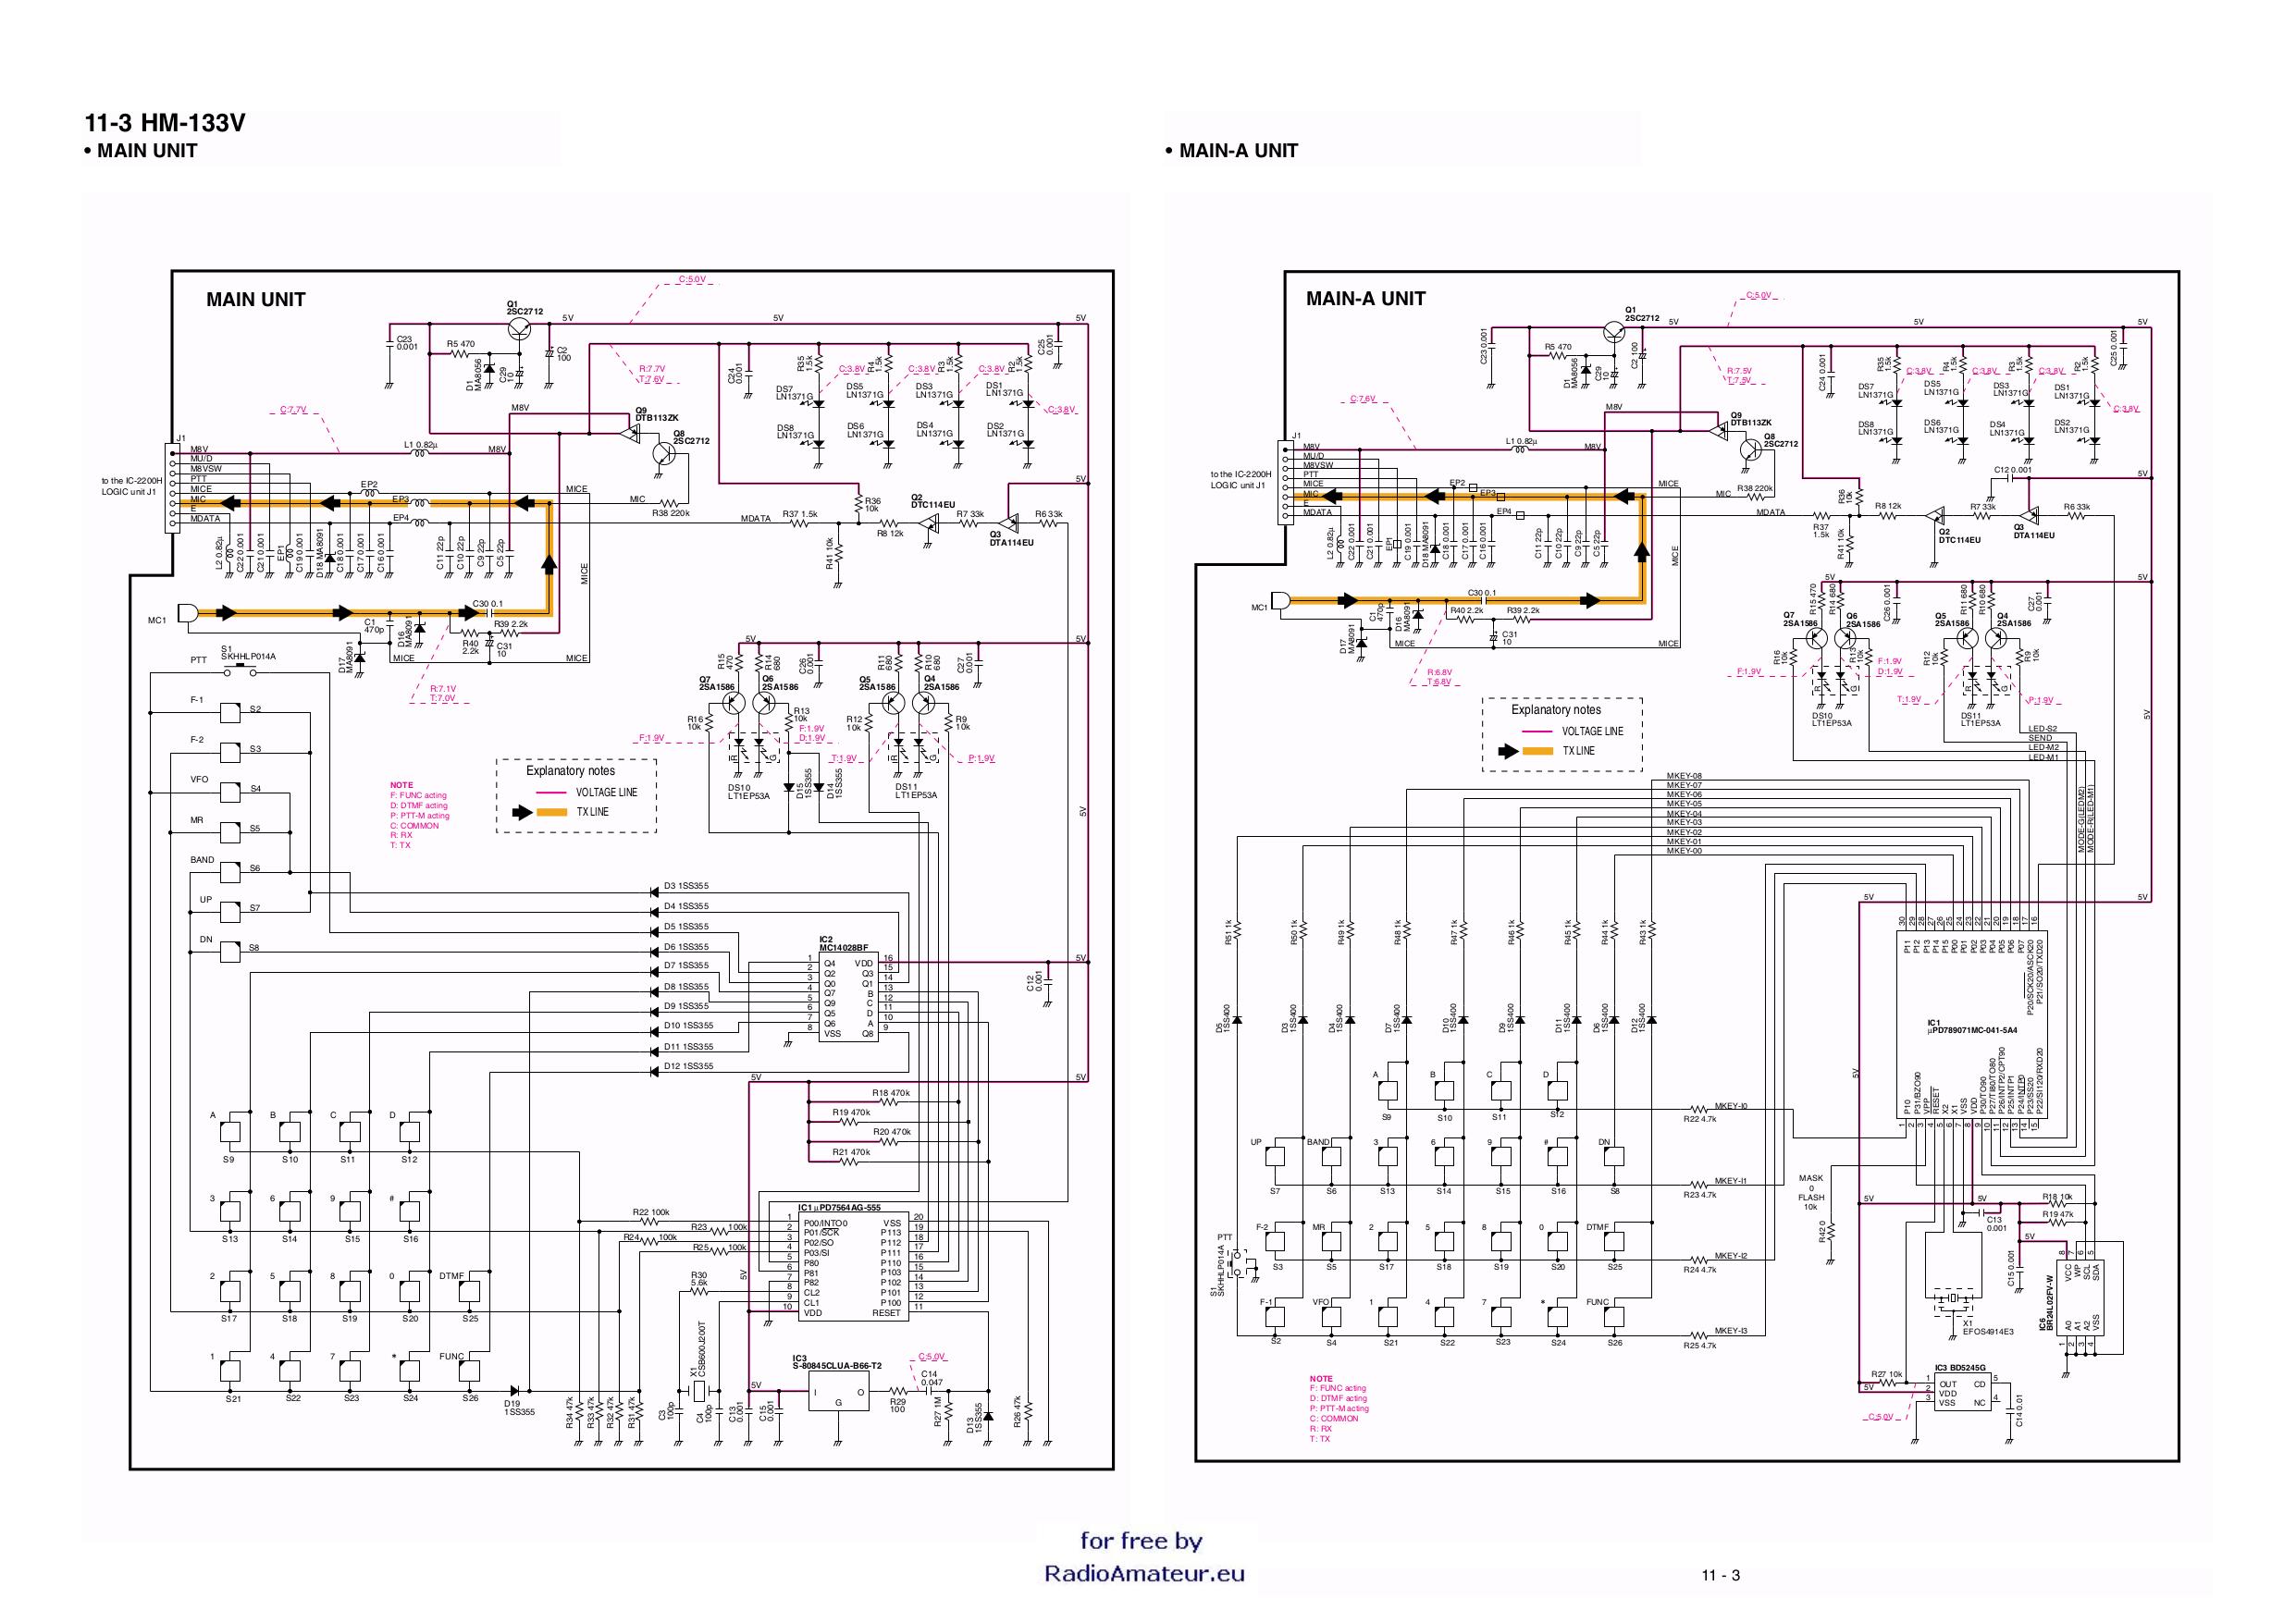 Icom Hm 152 Manual